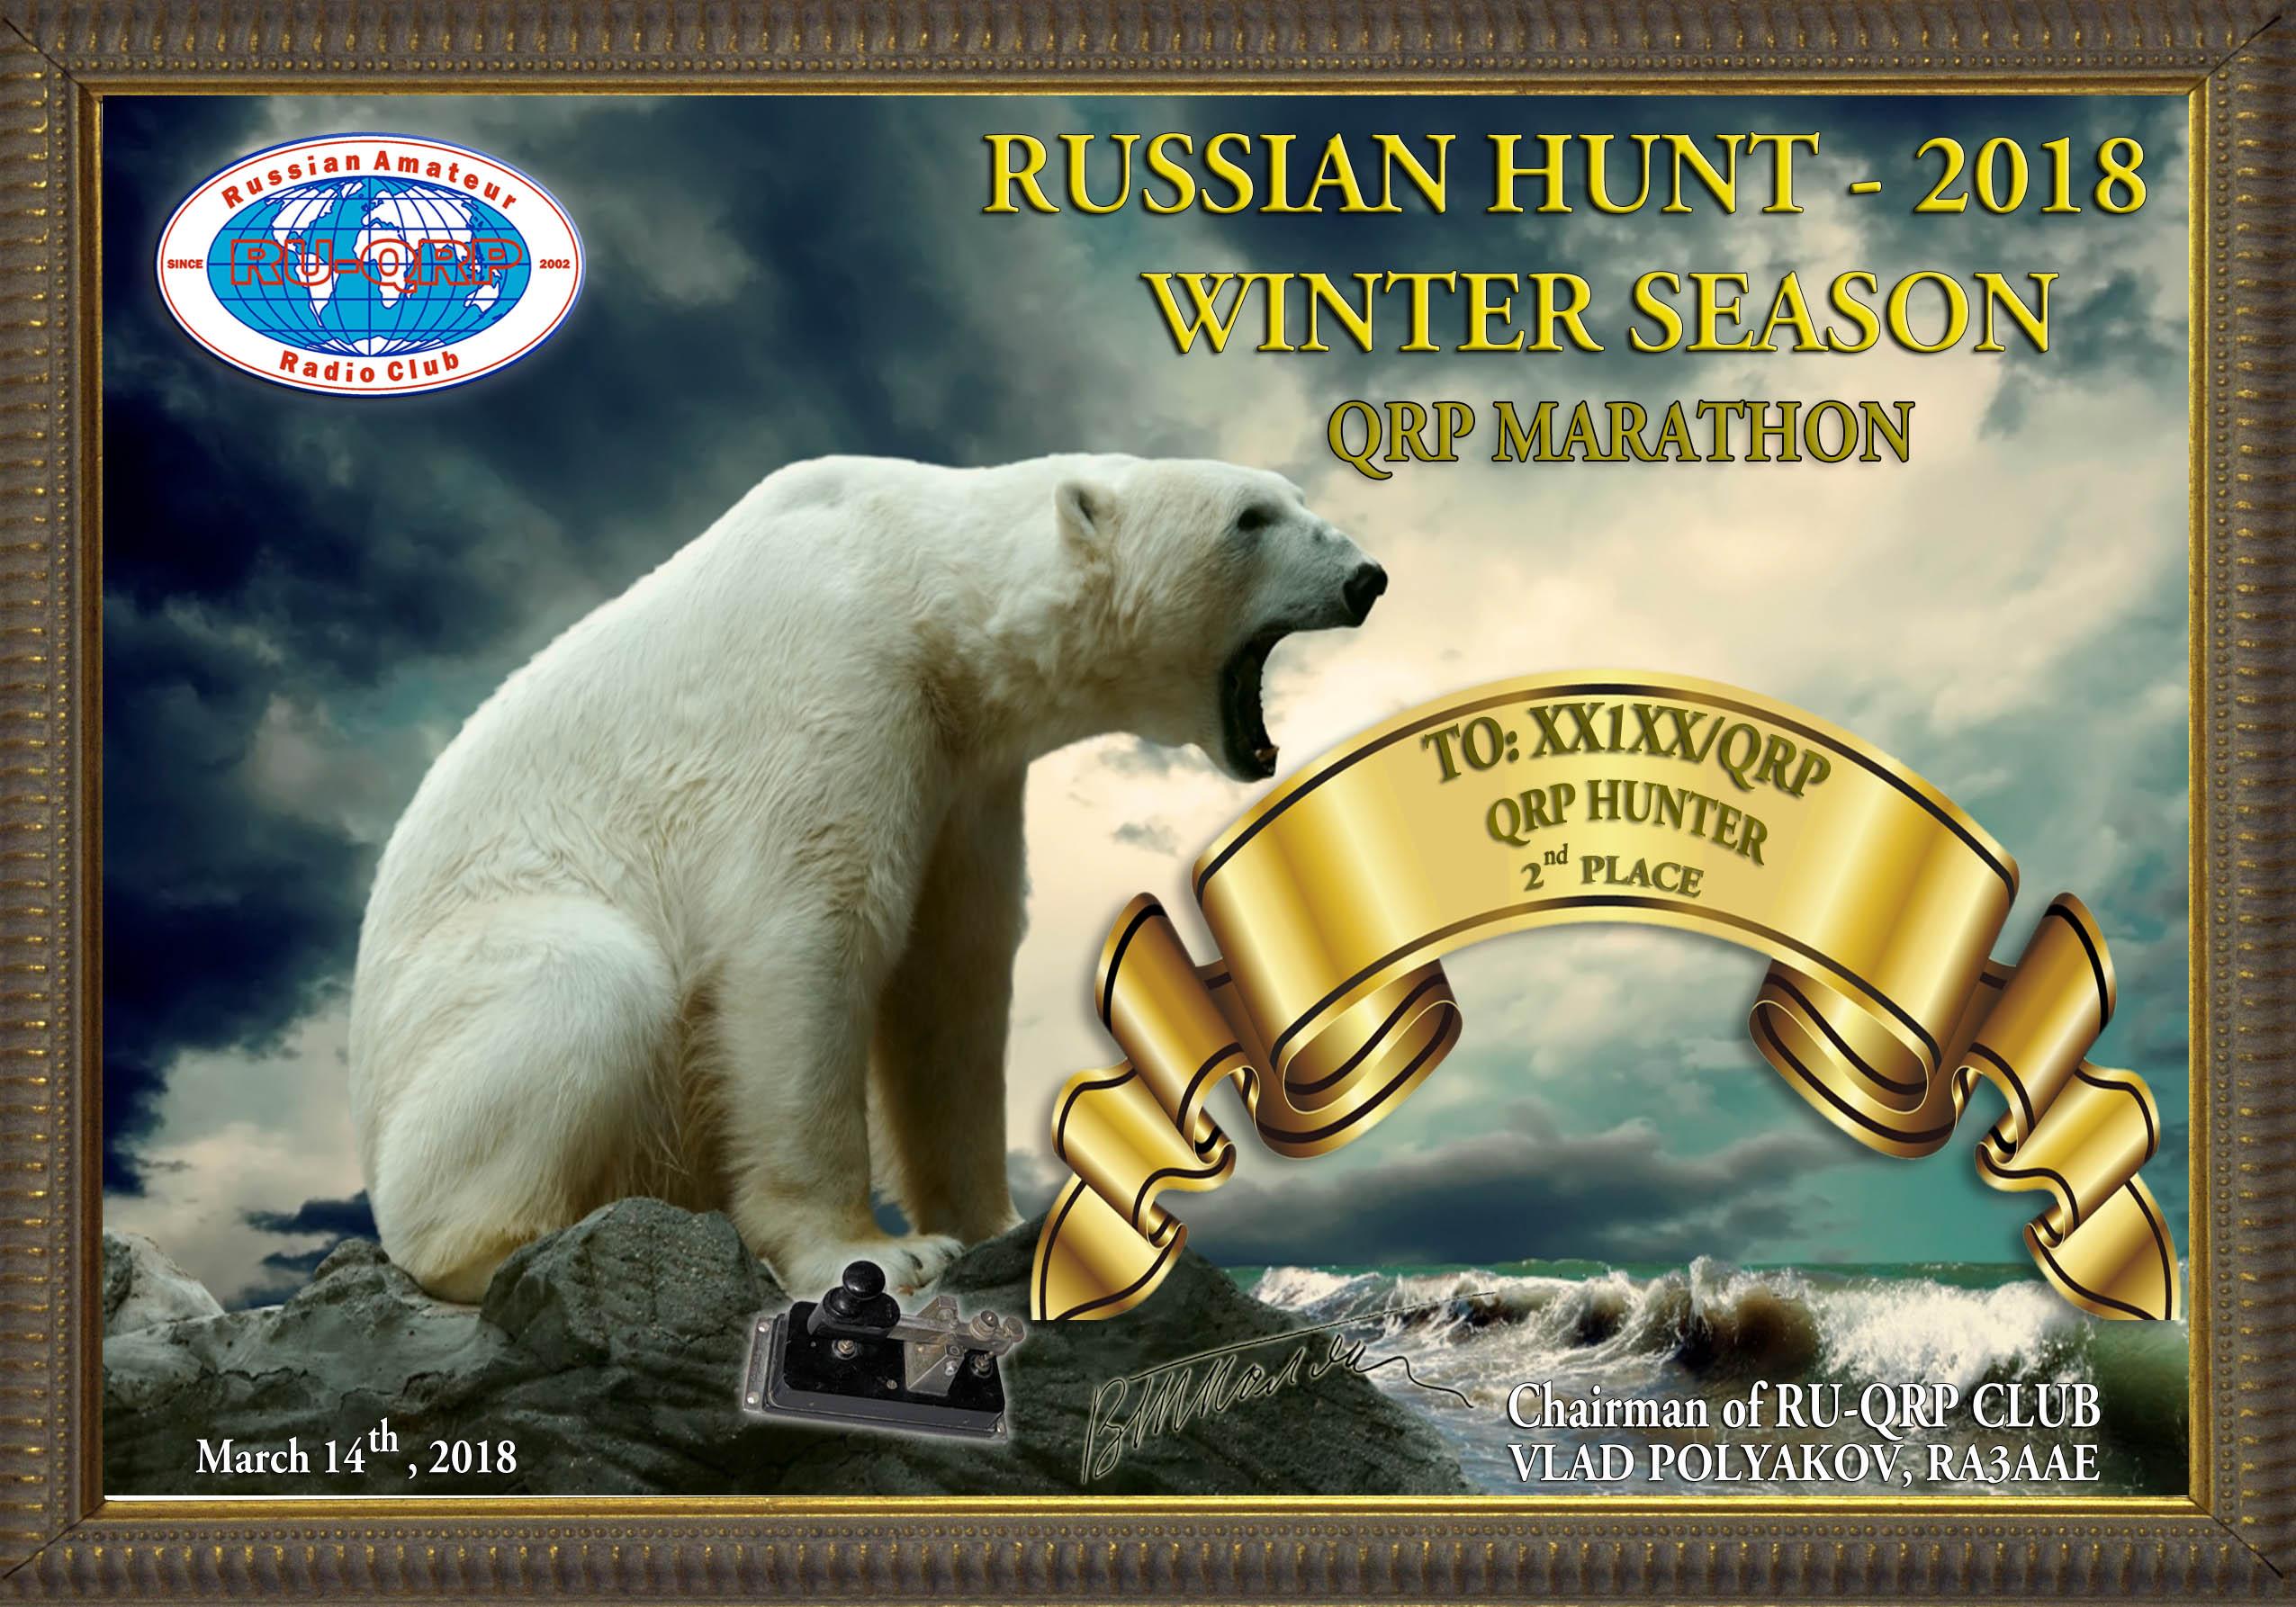 Нажмите на изображение для увеличения.  Название:2018- RUSSIAN HUNT WINTER SEASON.jpg Просмотров:5 Размер:570.9 Кб ID:204898